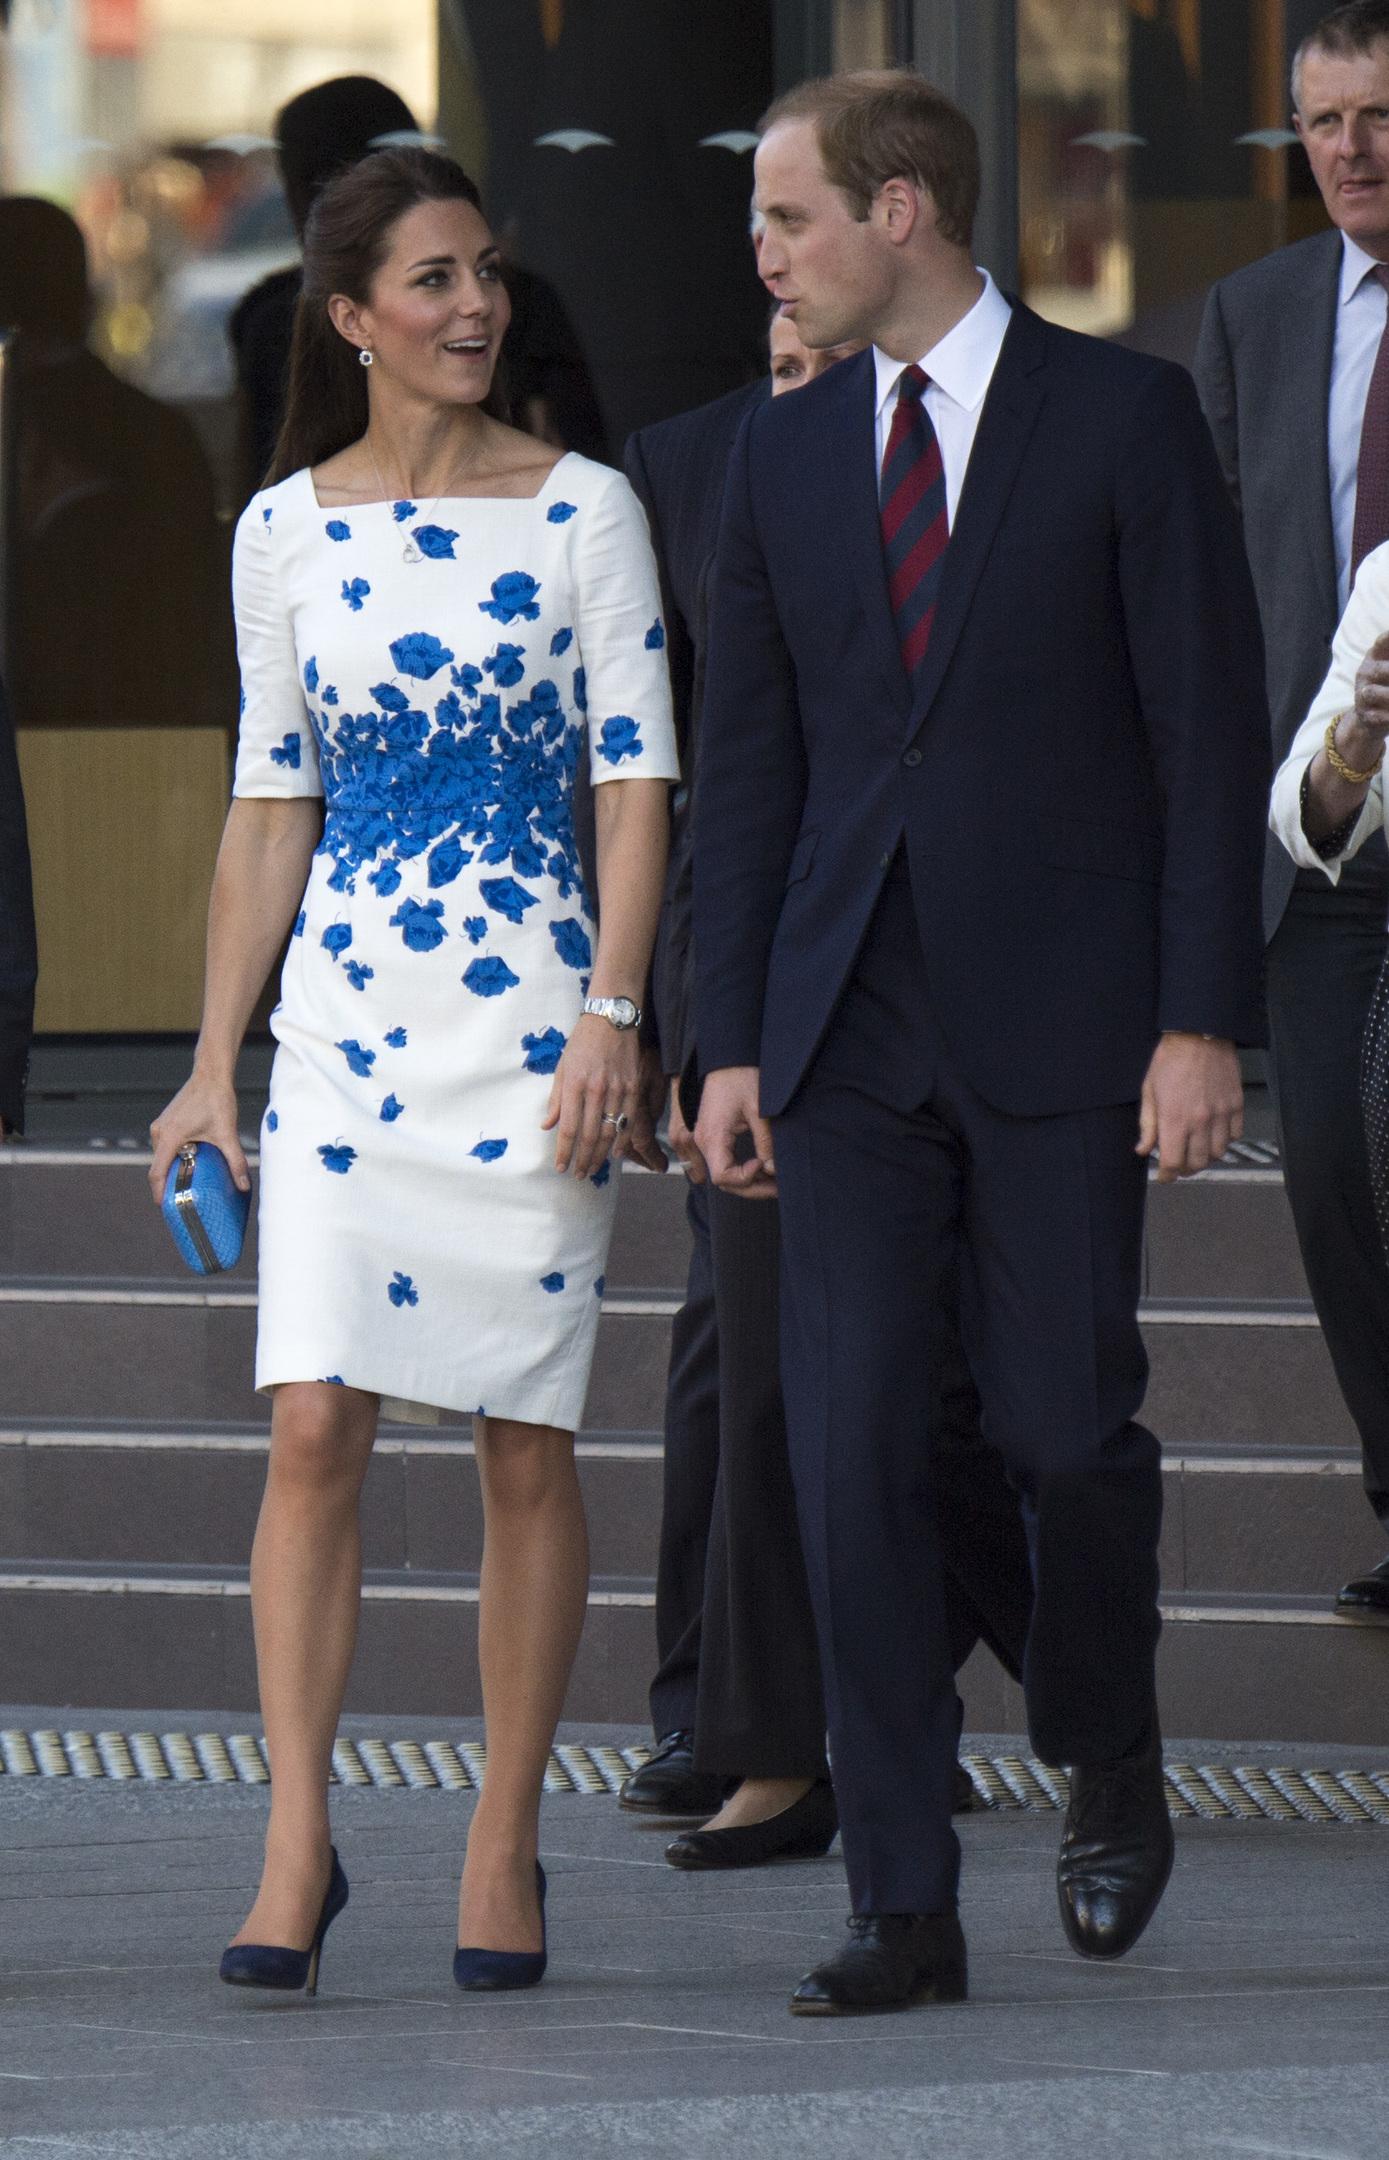 The Duke and Duchess of Cambridge (Arthur Edwards/The Sun)